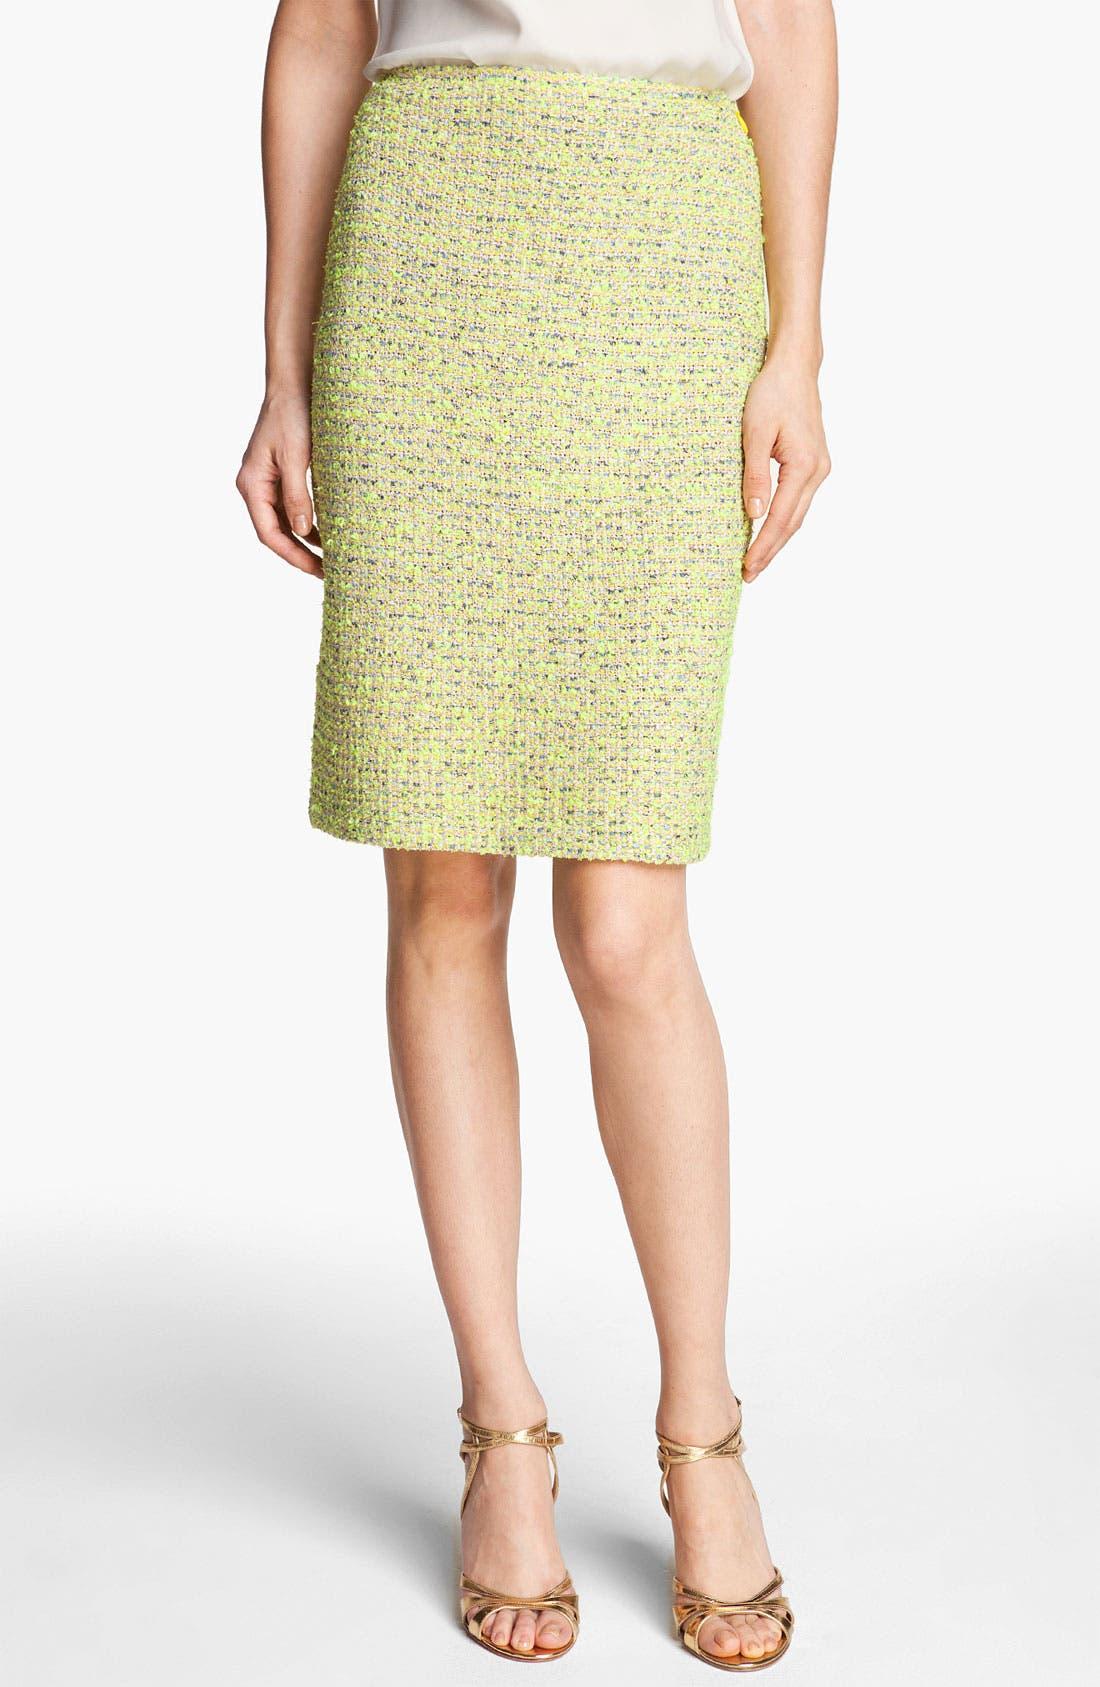 Alternate Image 1 Selected - St. John Collection 'Park Lane' Tweed Skirt